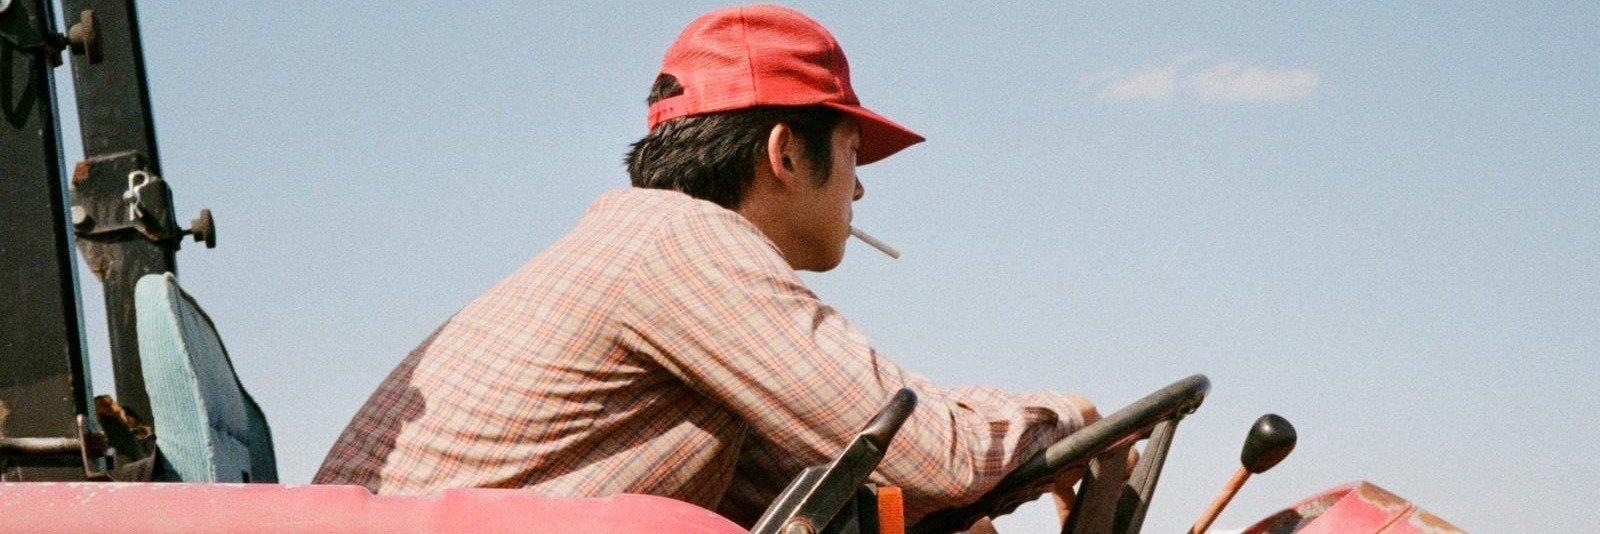 Przedstawiamy: Minari (Original Motion Picture Soundtrack)